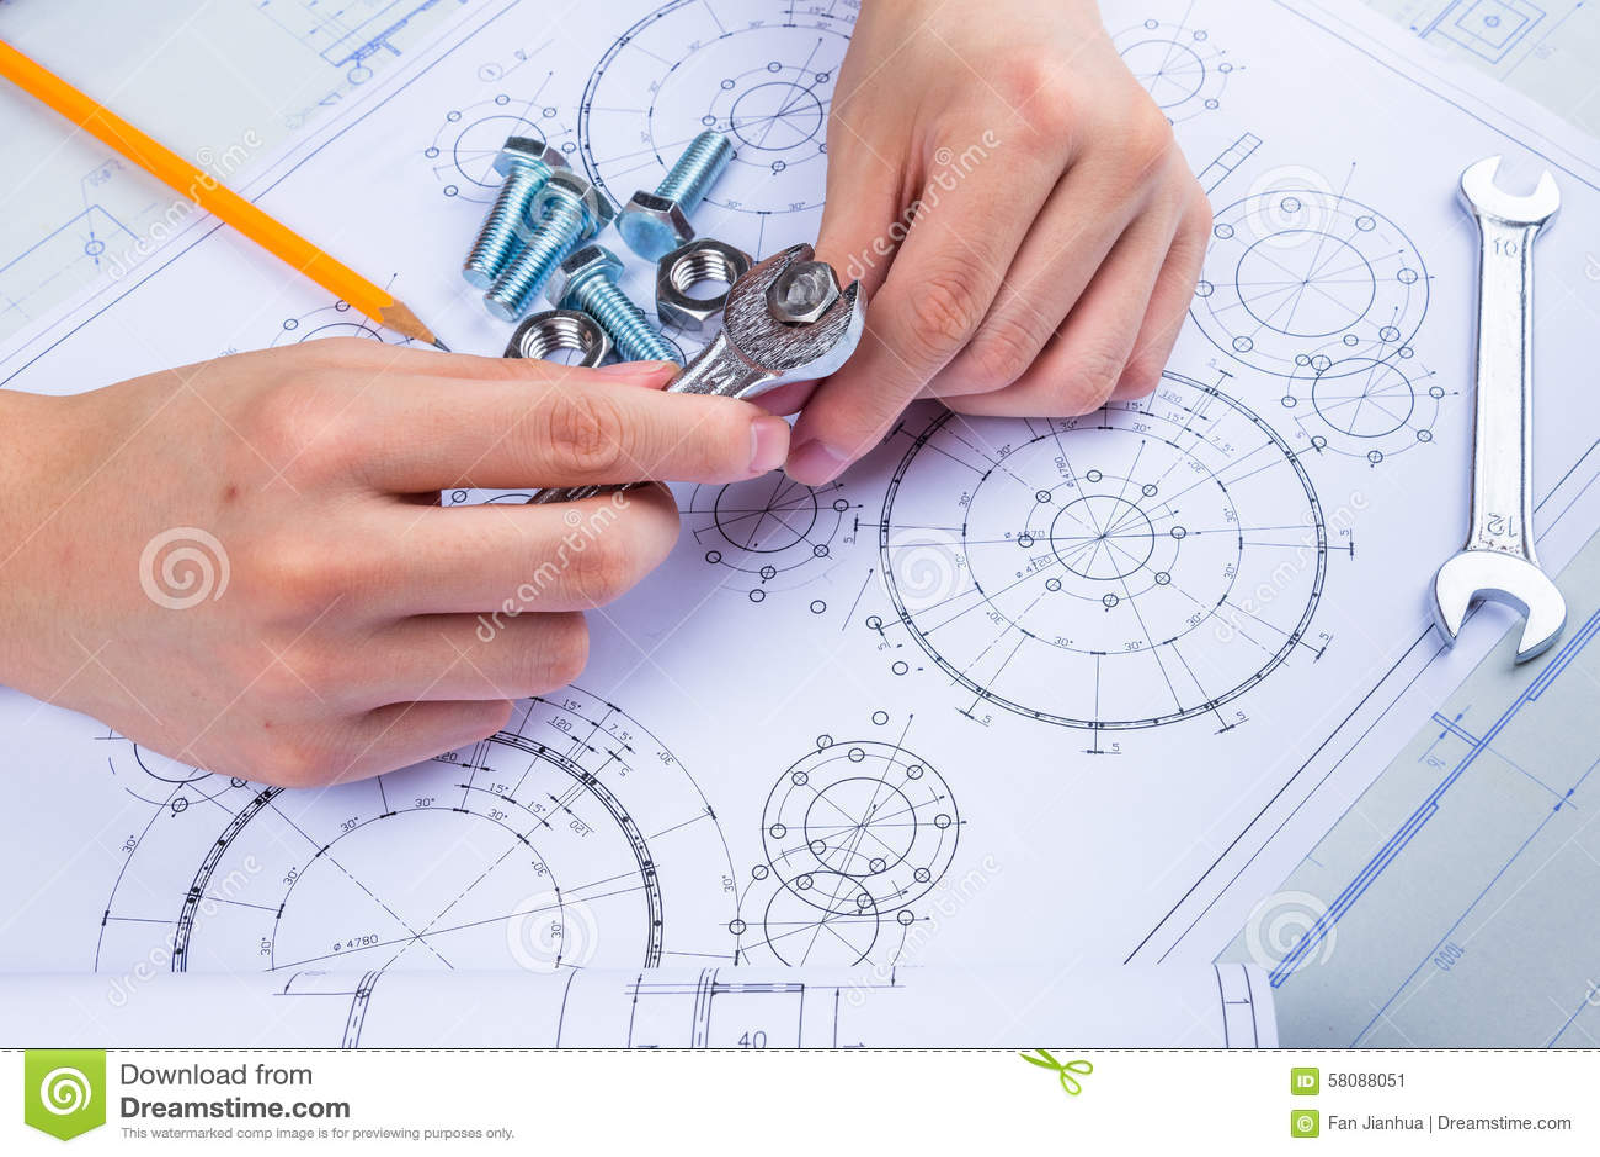 Mechanical Design Engineer in drawing